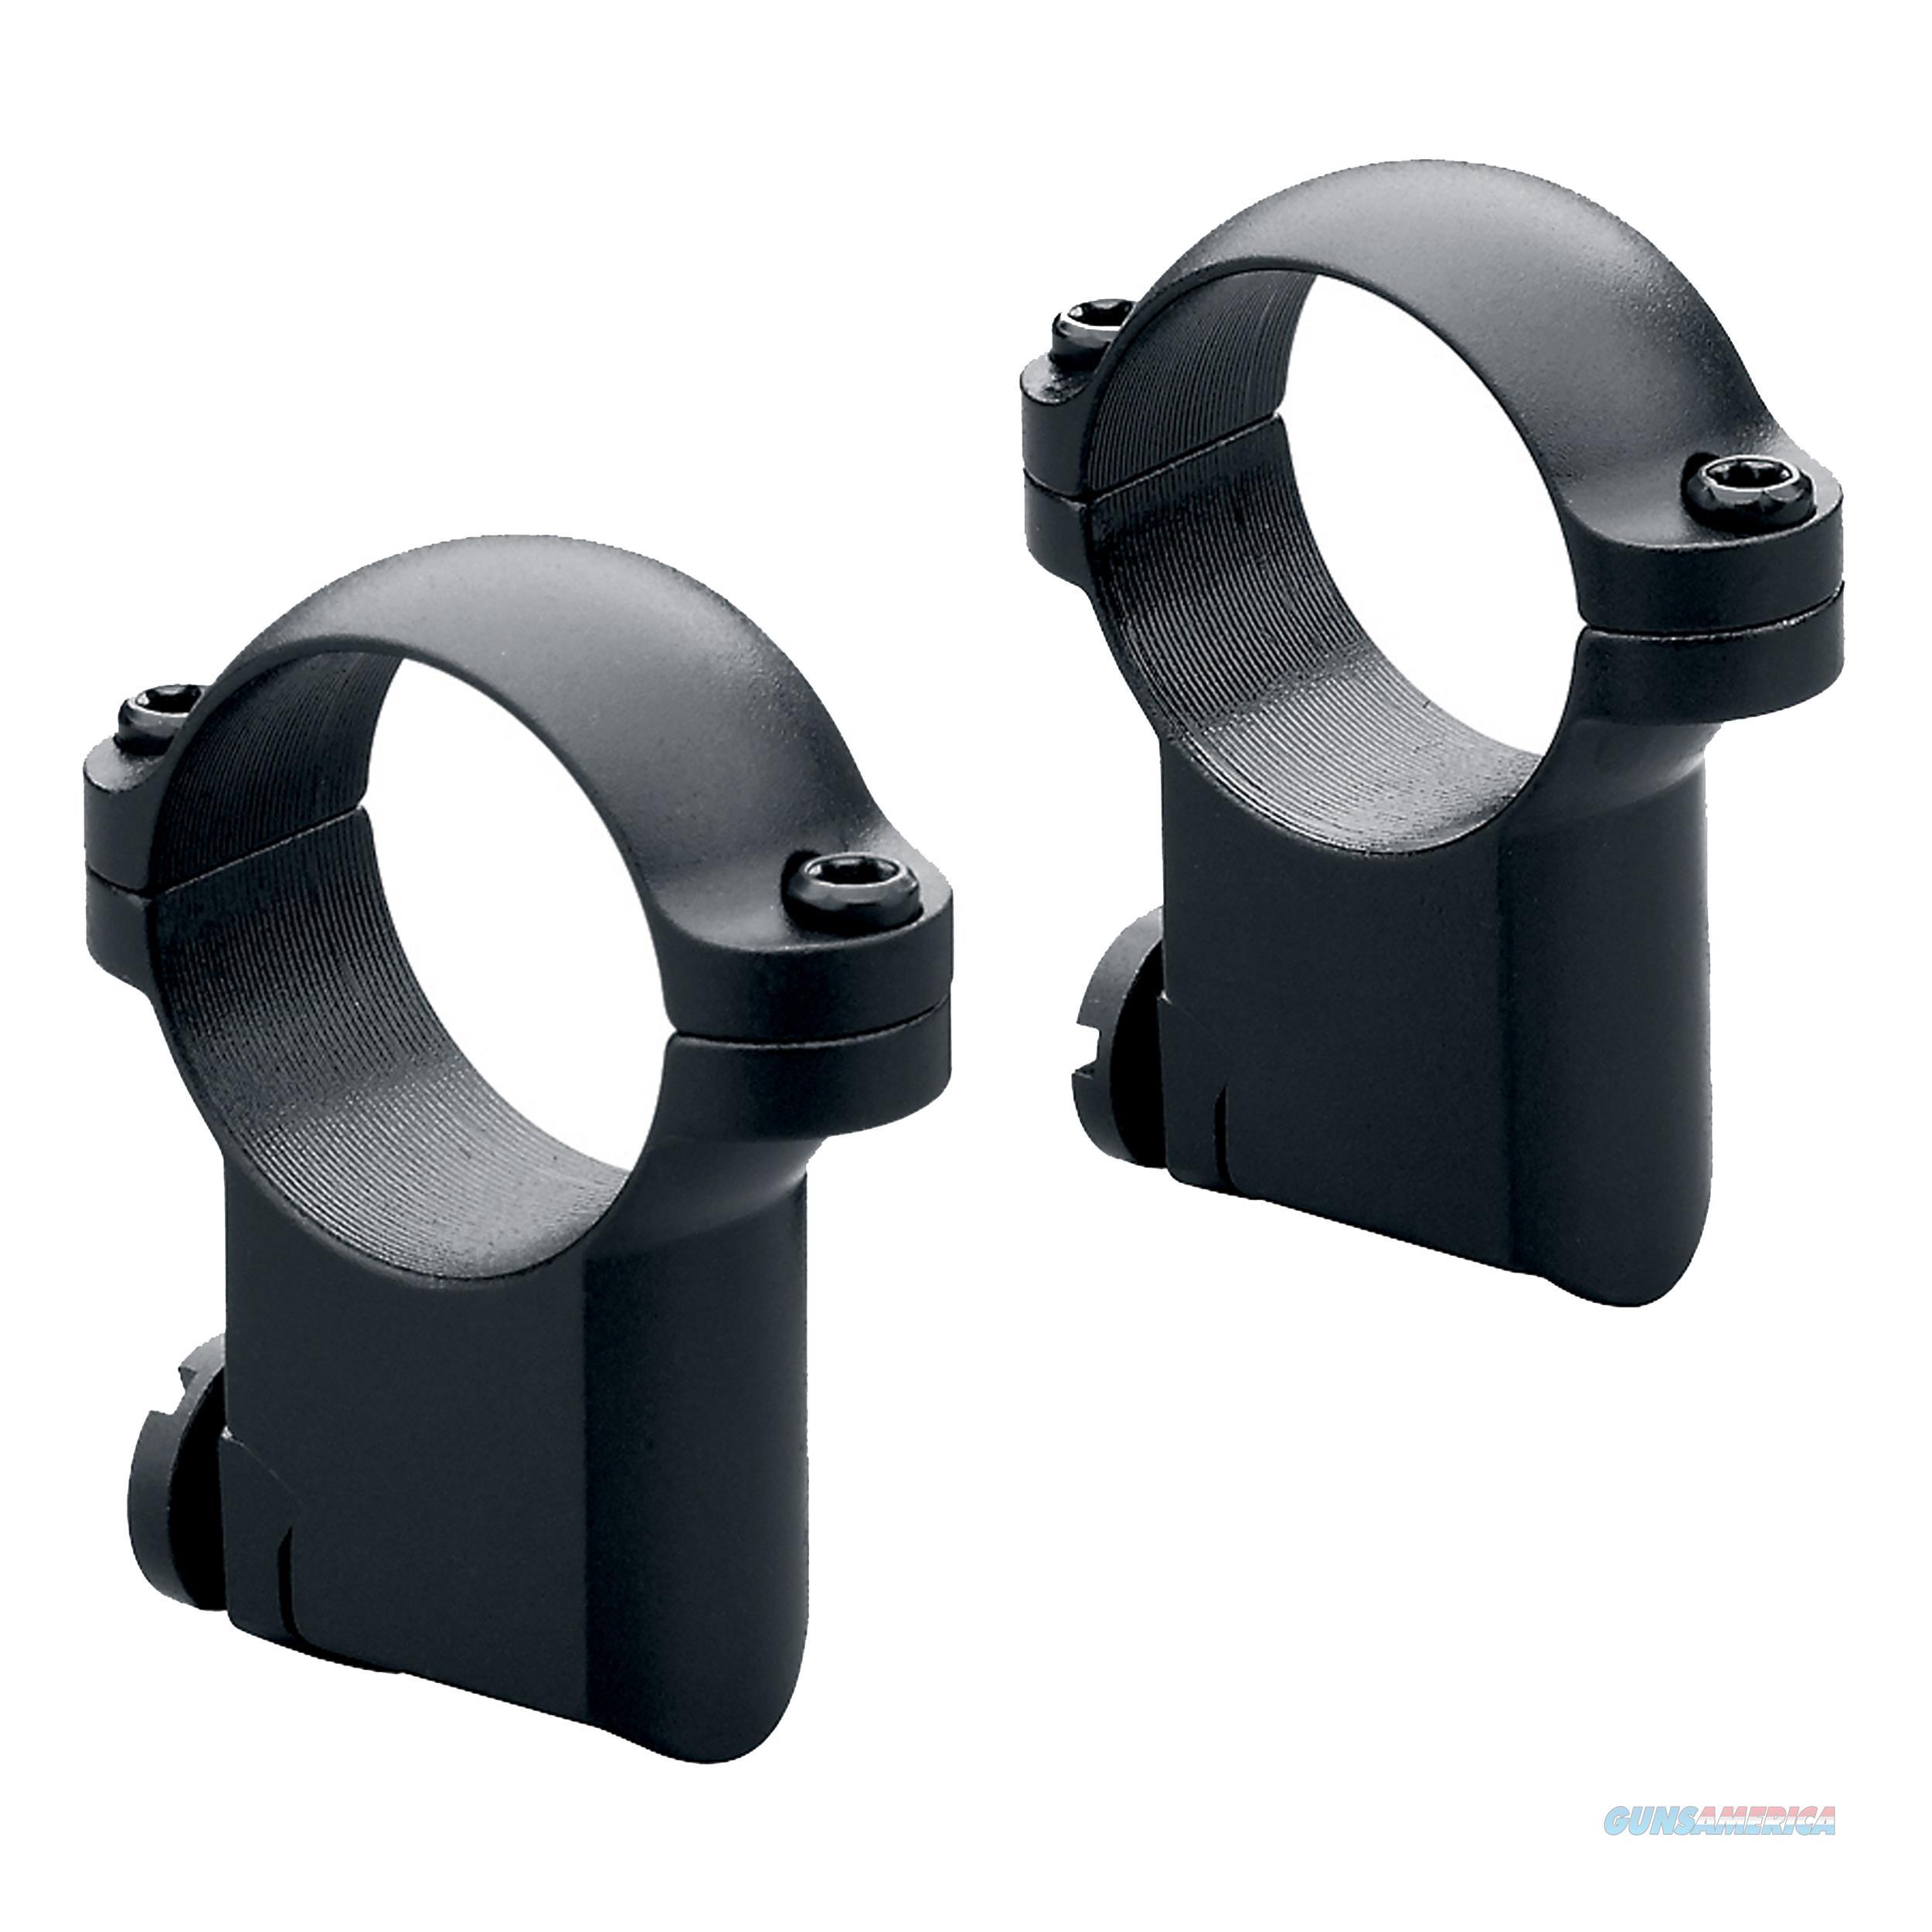 Leupold Rings Rug M77 1 Med Matte 170351  Non-Guns > Scopes/Mounts/Rings & Optics > Mounts > Other